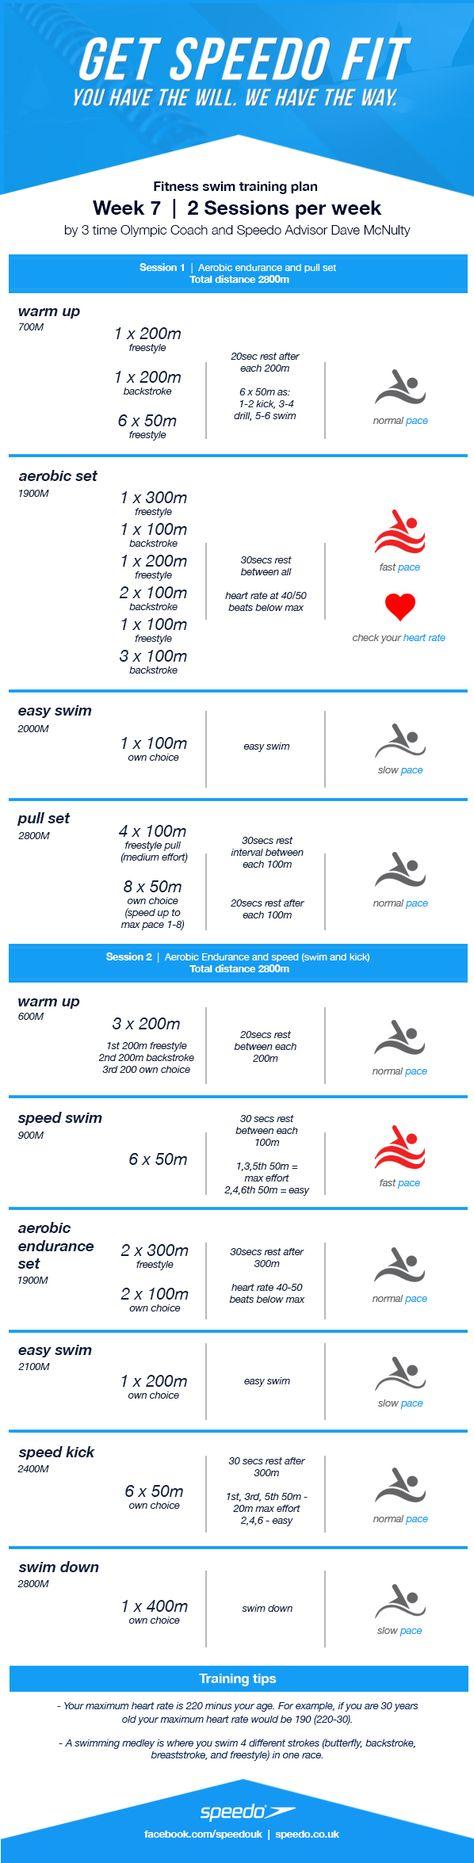 Dave Mcnulty Swim Fitness Training Plan Week 7 Speedo Swim